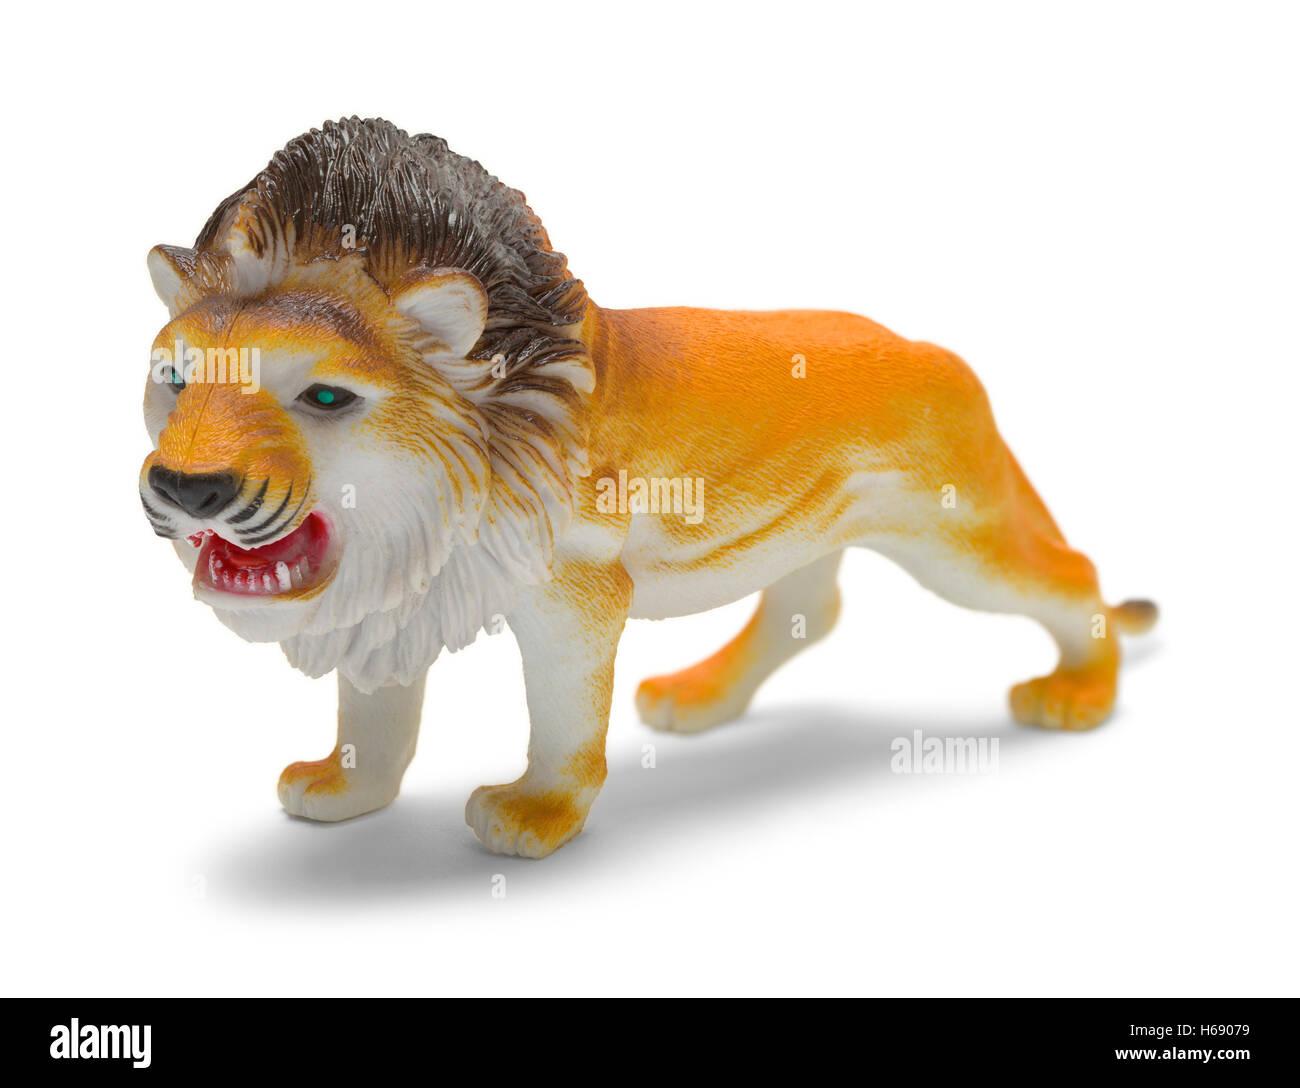 Plastic Lion Toy Isolated on White Background. - Stock Image